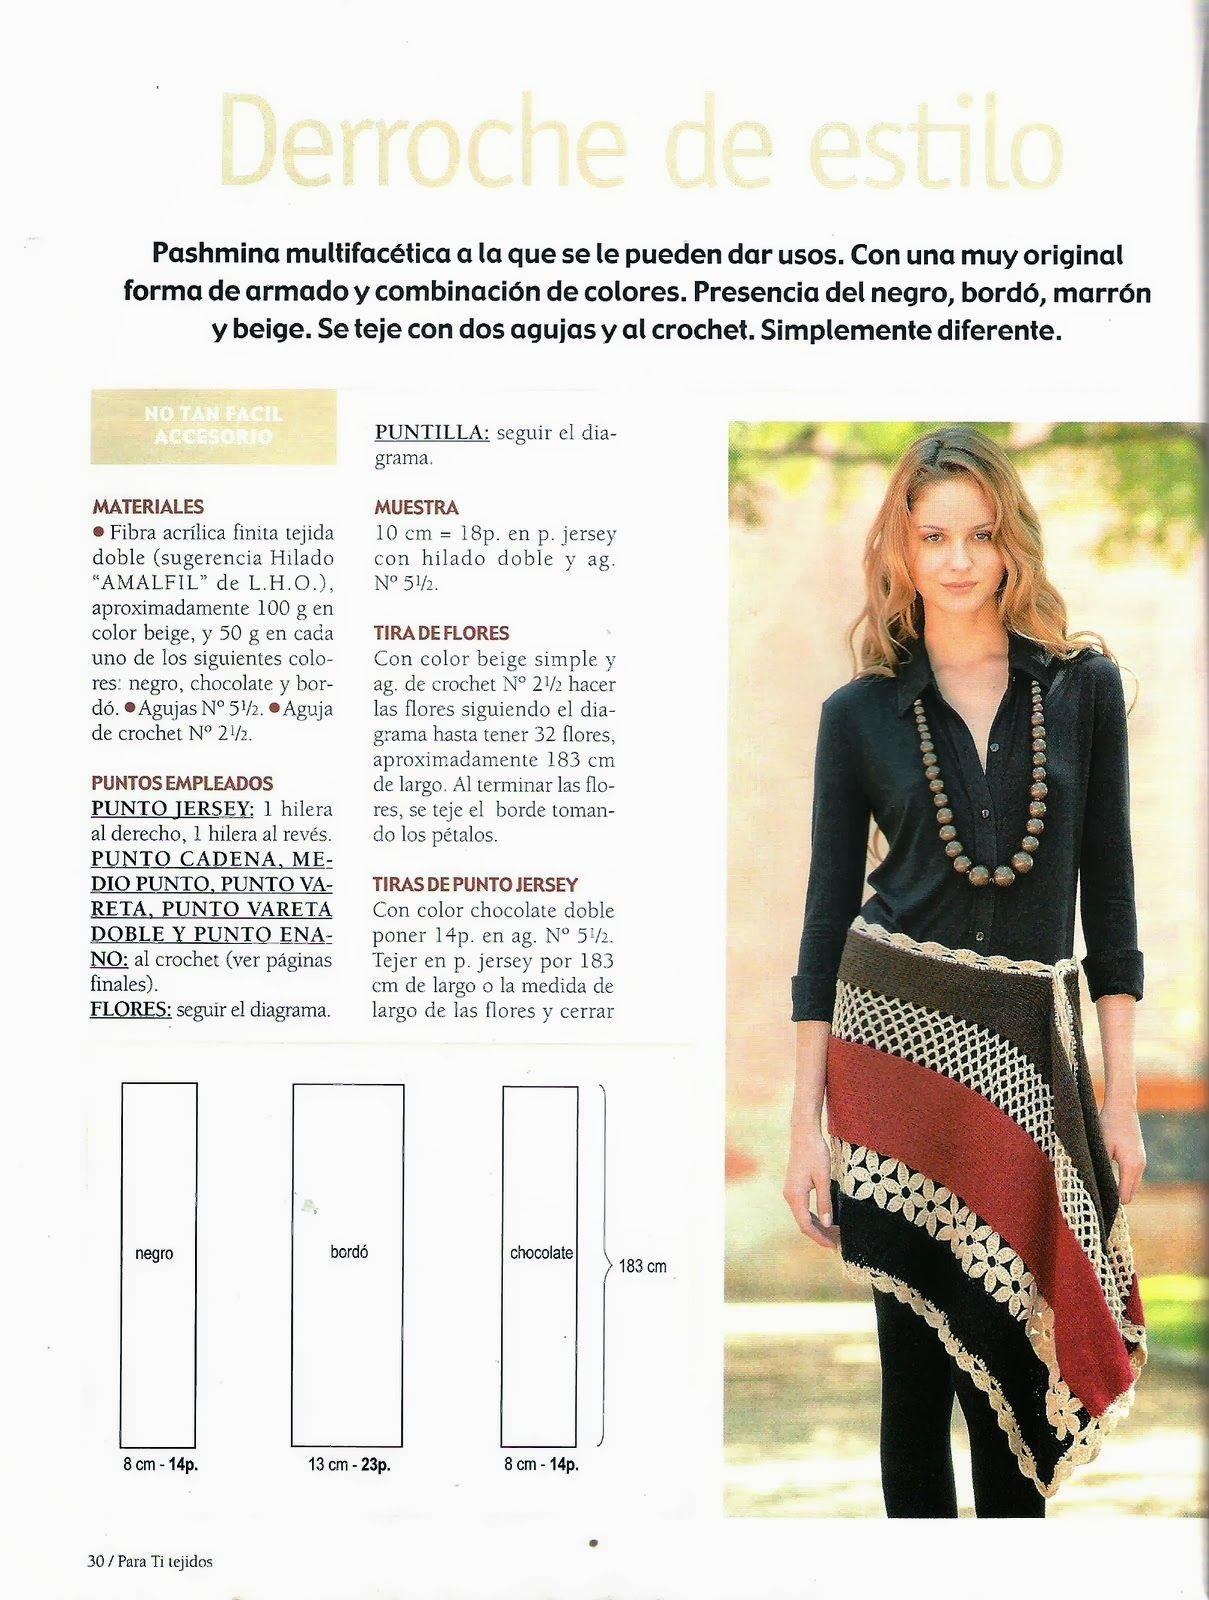 Faceted Pashmina Knitting Crochet Instructions - Crochet Patterns ...